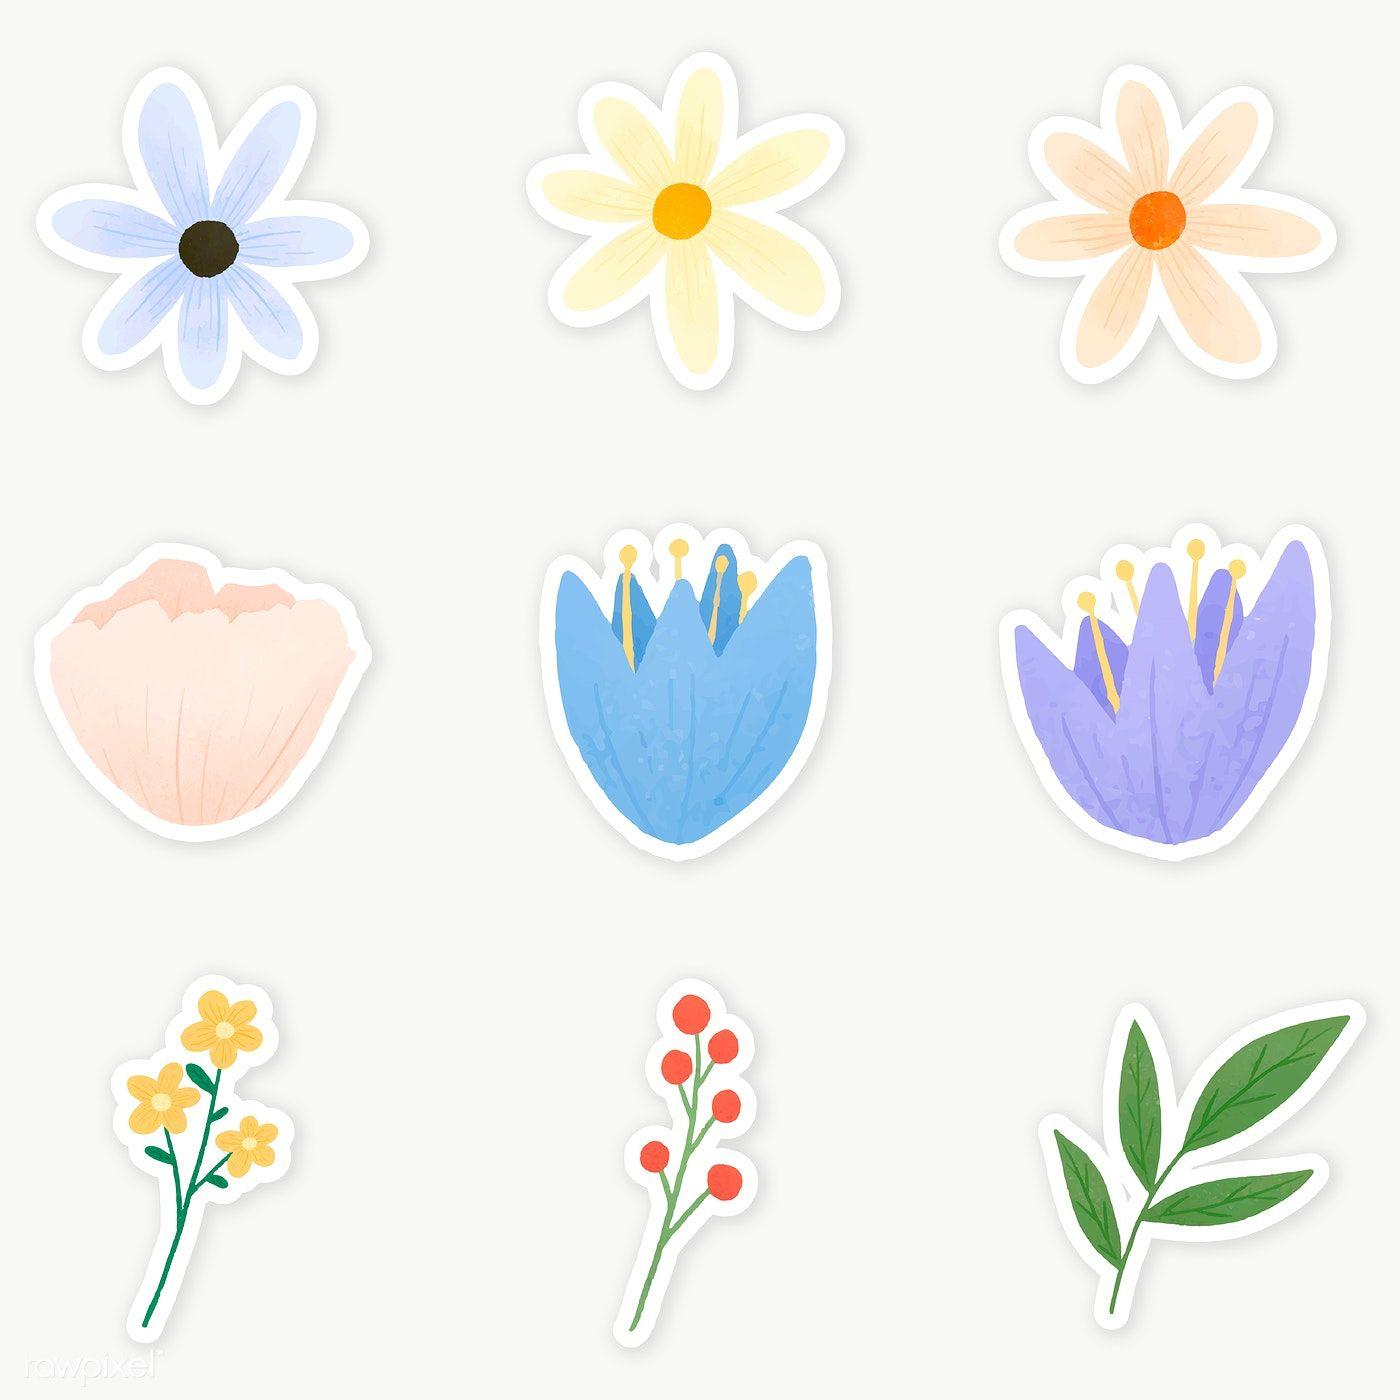 Colorful Floral Sticker Set Transparent Png Premium Image By Rawpixel Com Katie Moir Floral Stickers Flower Illustration Print Stickers